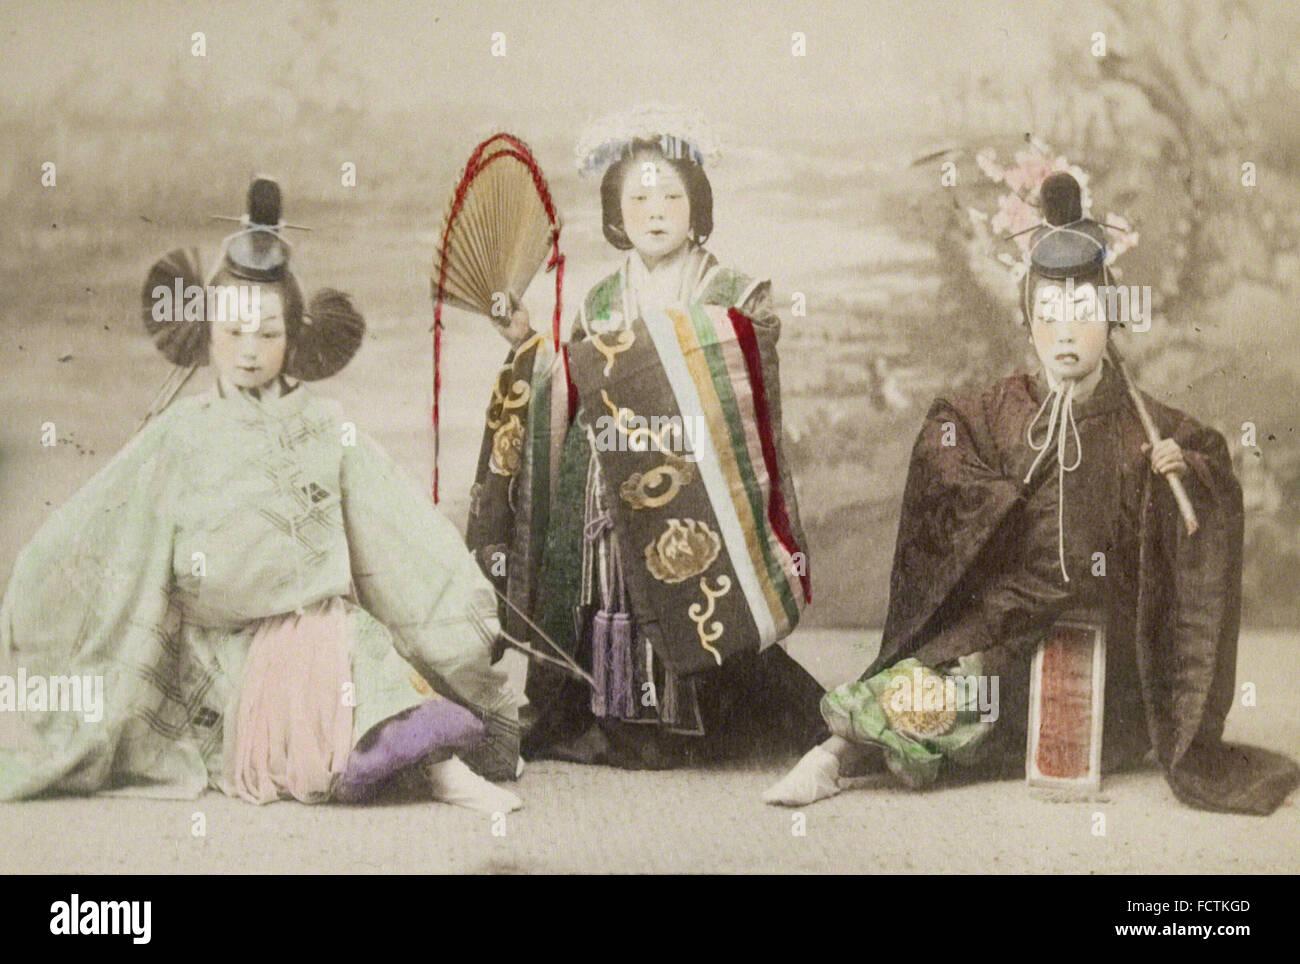 Kusakabe Kimbei - ragazze eseguendo danze storiche Immagini Stock